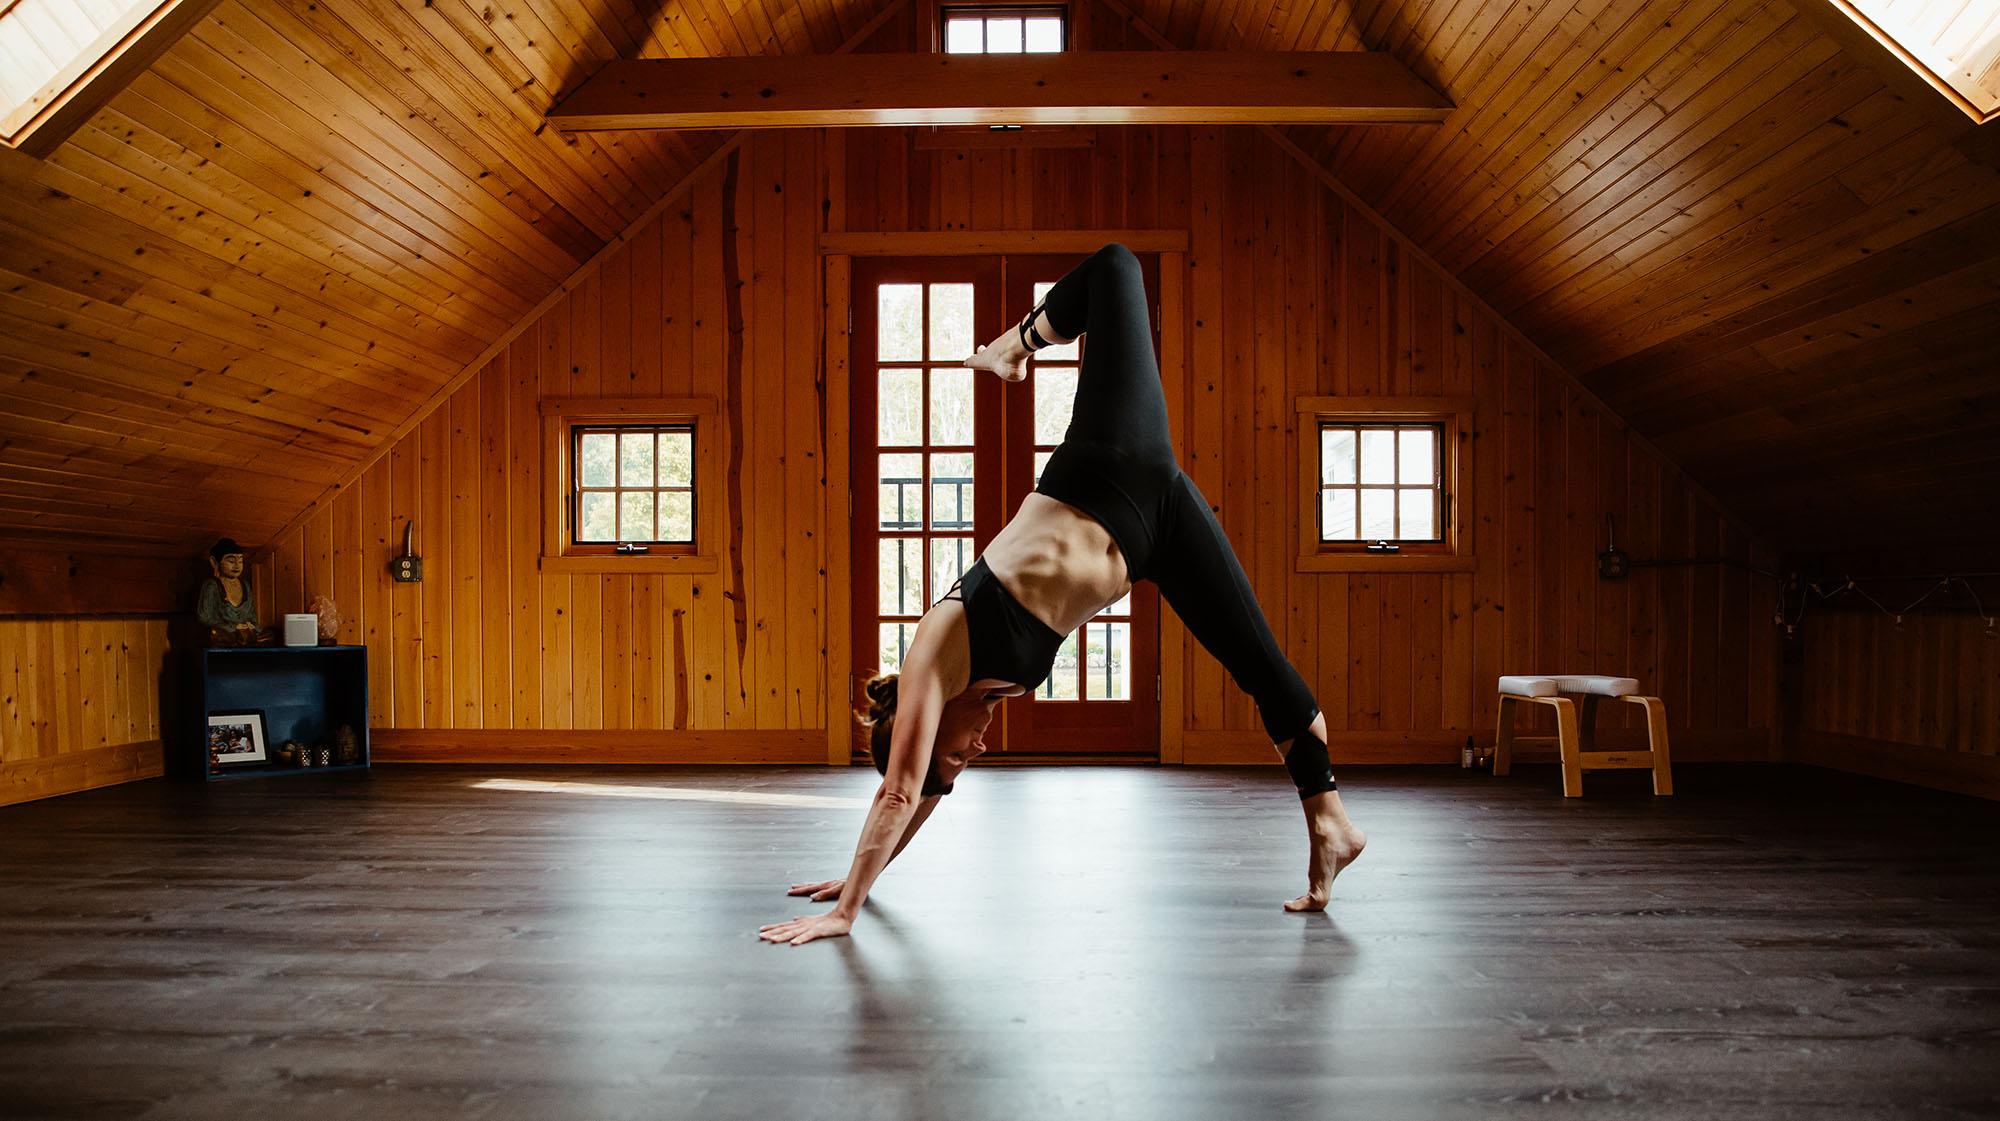 community-yoga-meditation-reiki-sudbury.jpg